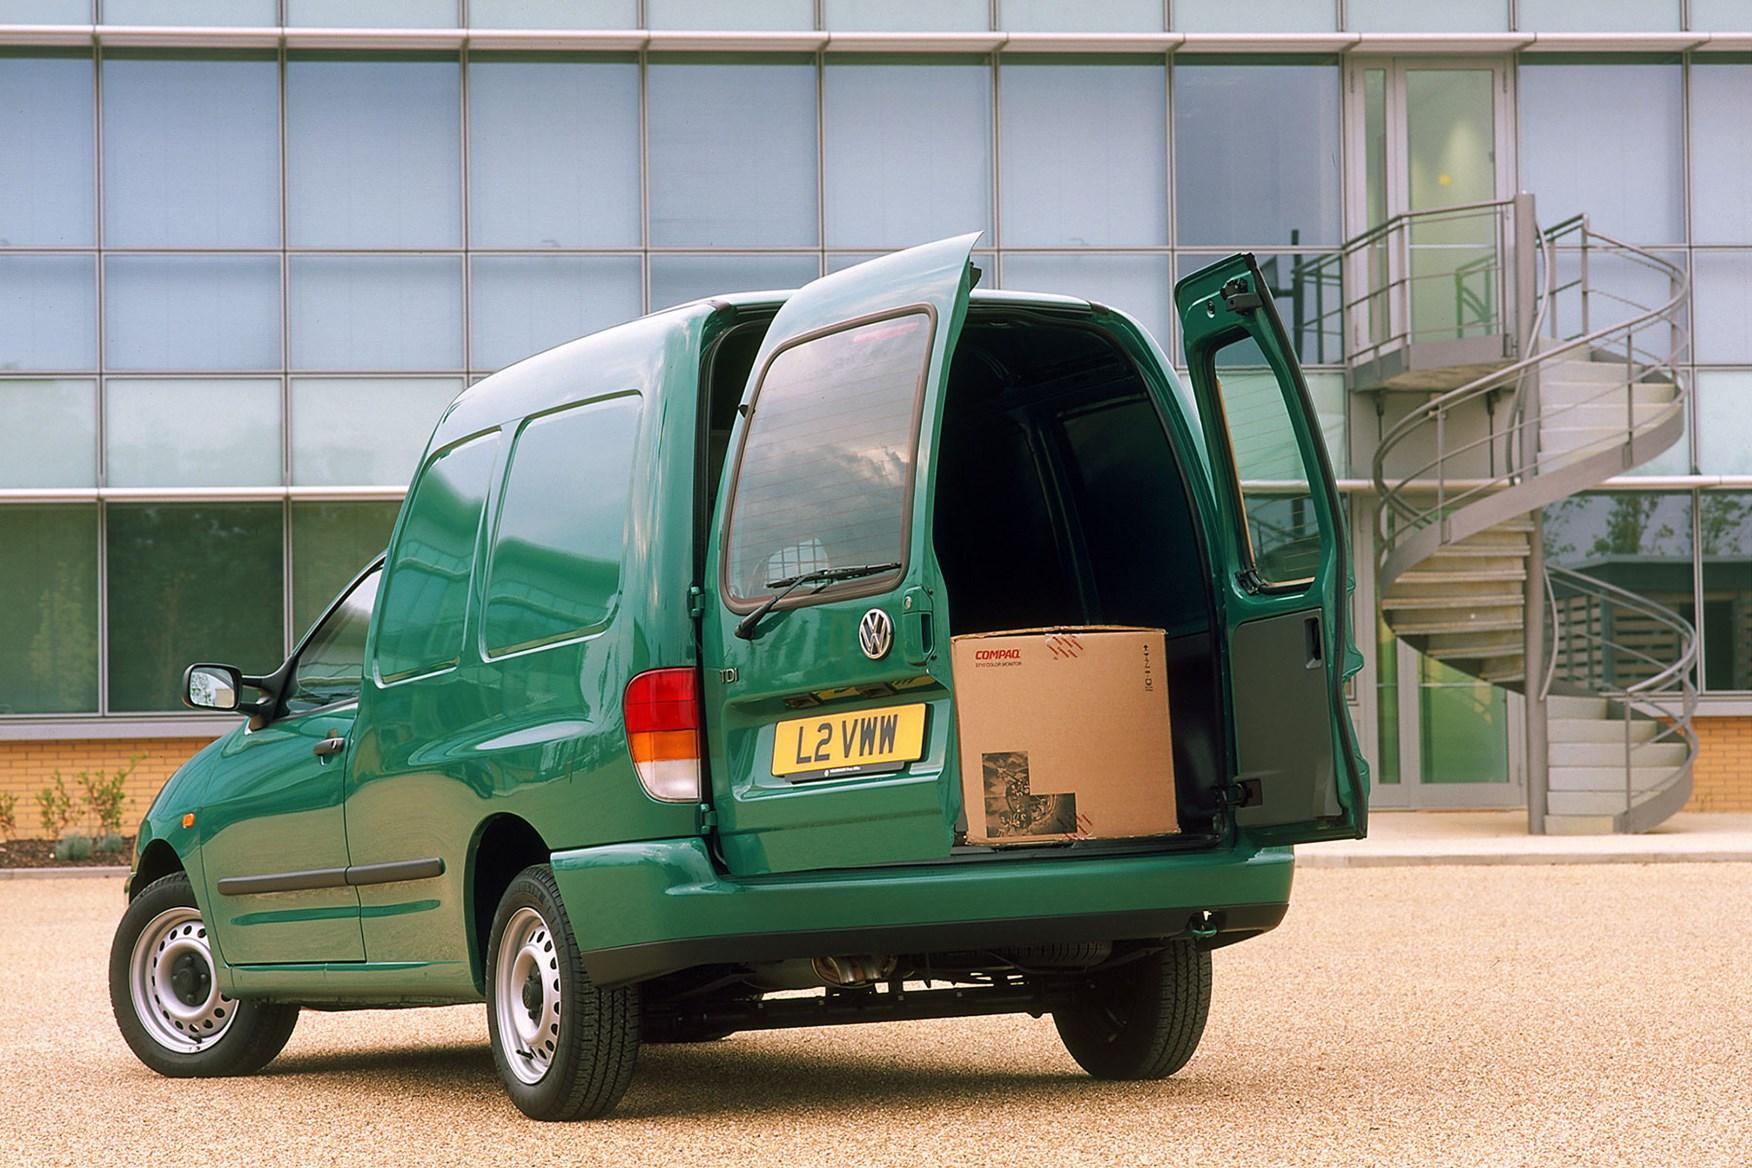 Volkswagen Caddy Van Dimensions 1996 2003 Capacity Payload Volume Towing Parkers